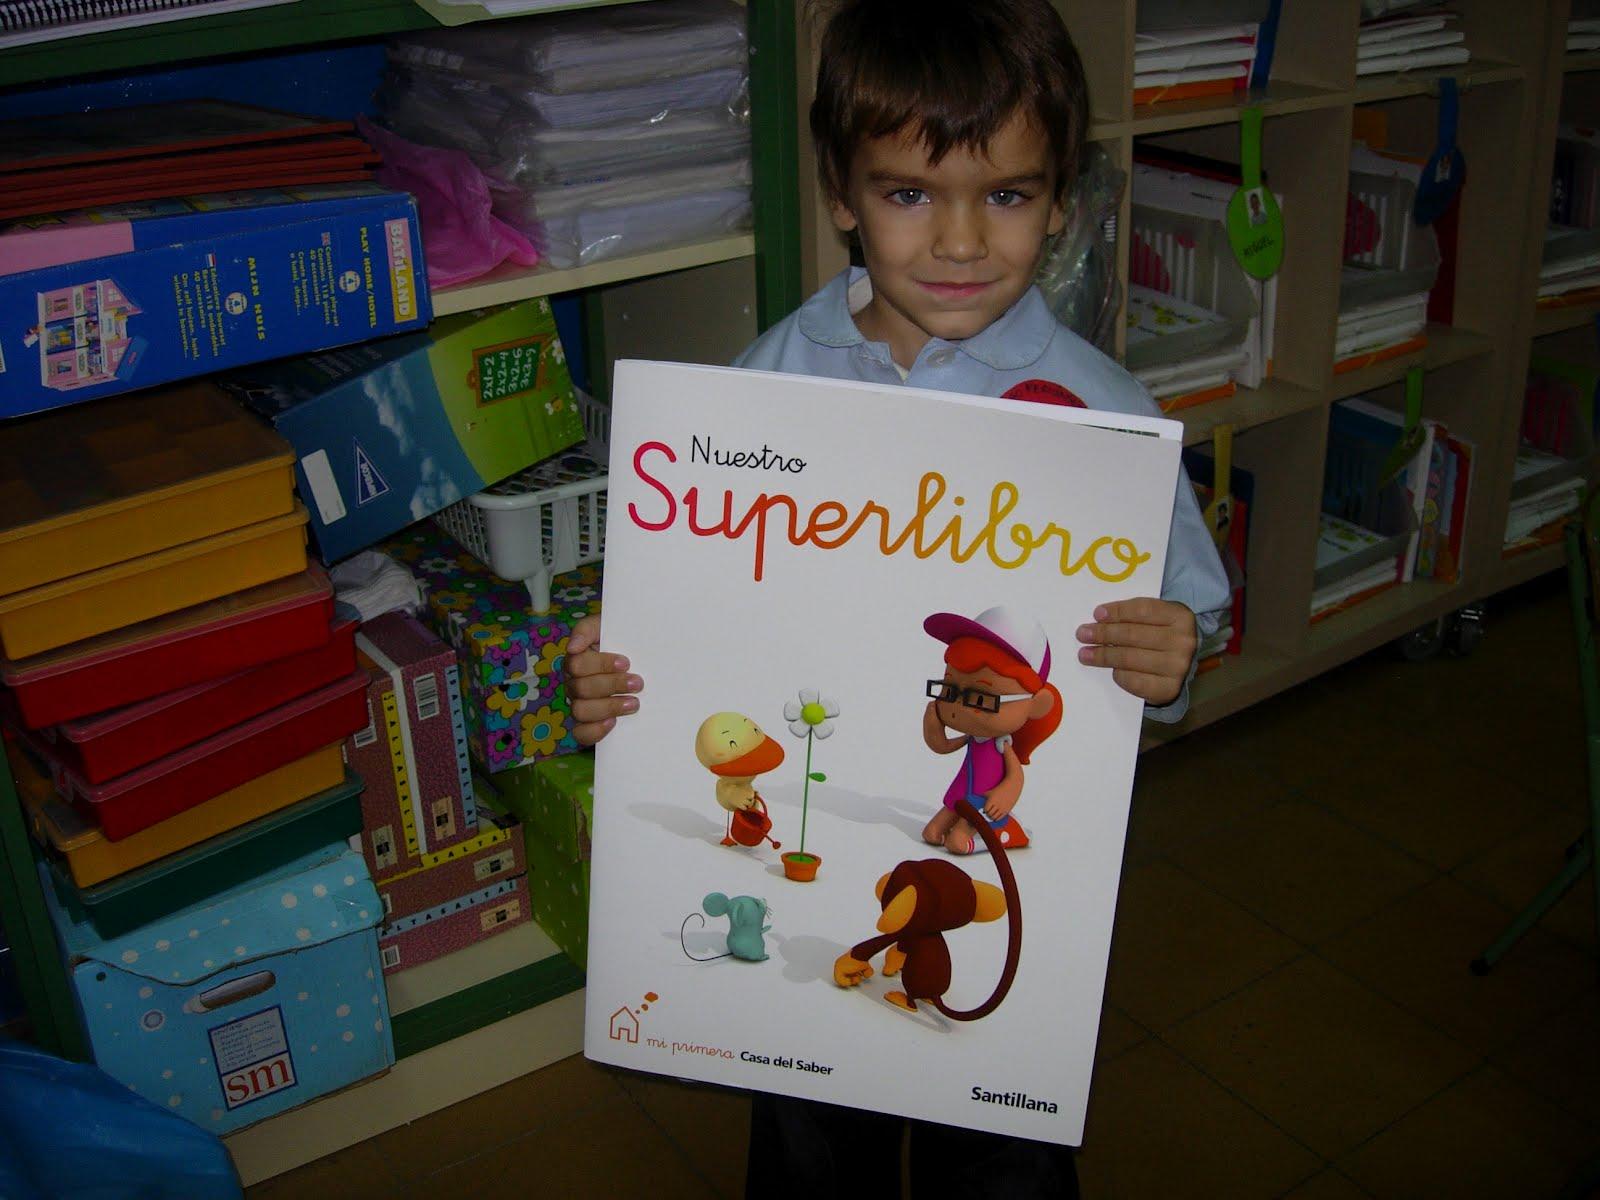 Arias montano infantil diego 4 a os a el libro viajero - Ideas libro viajero infantil ...